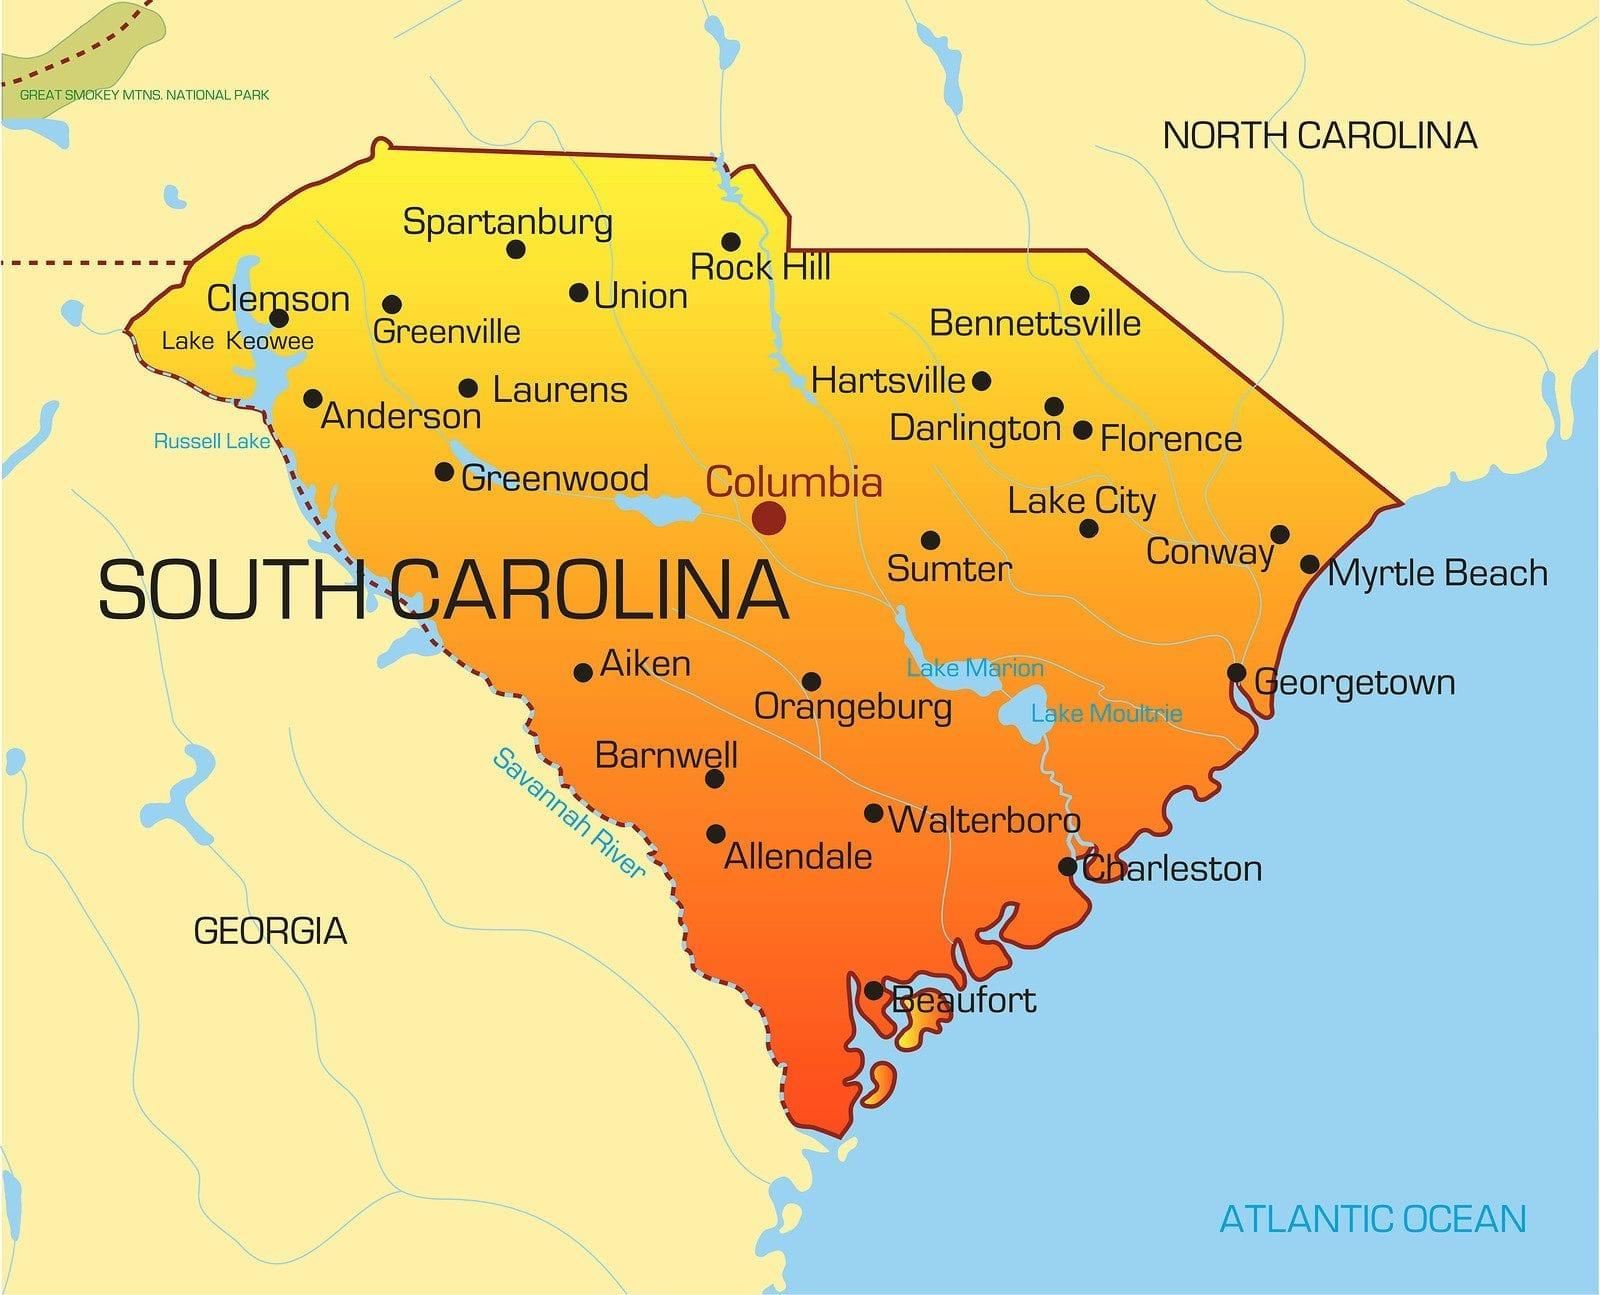 South Carolina Lpn Requirements And Training Programs